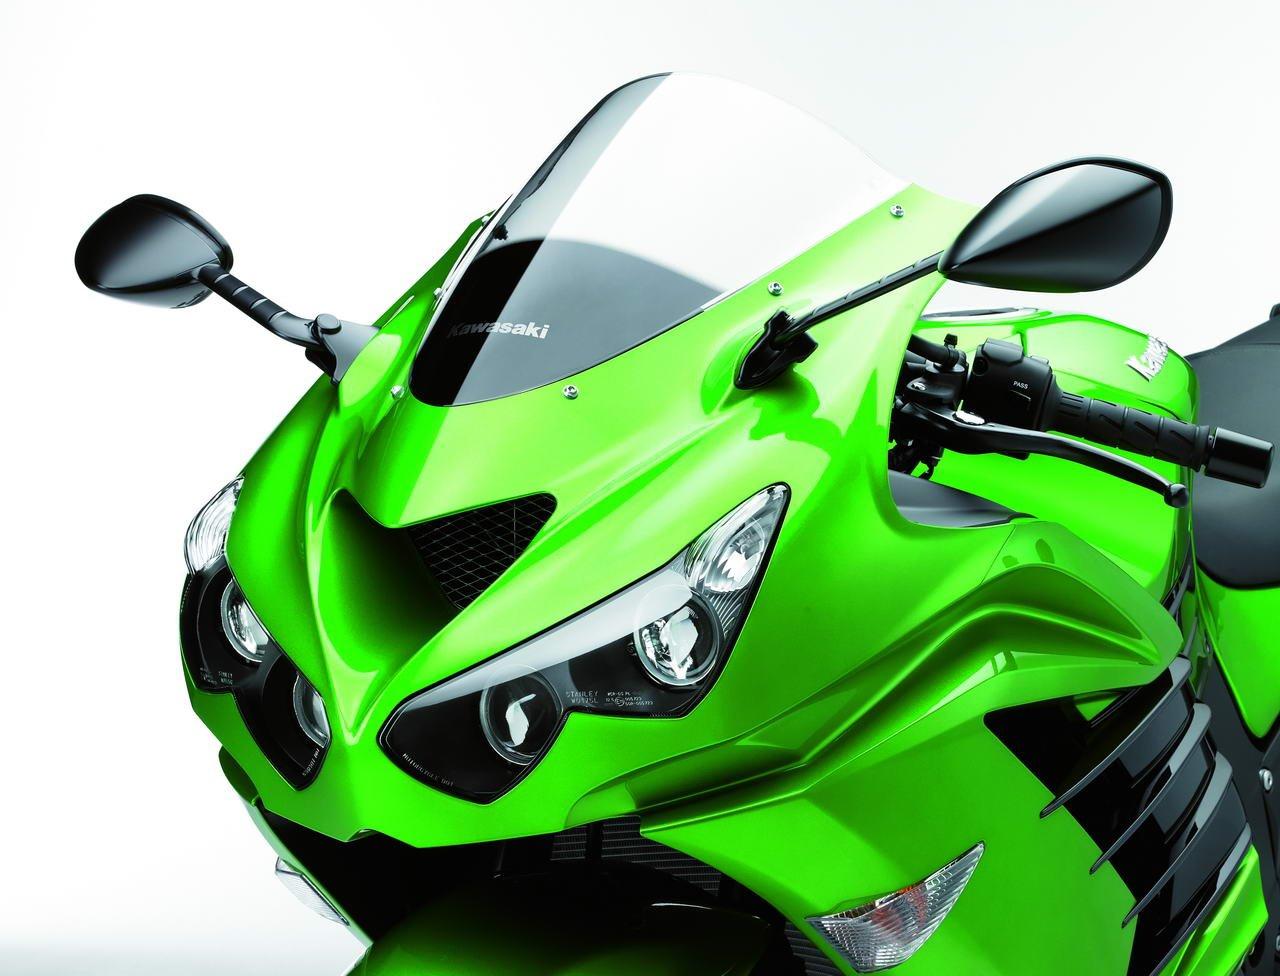 Listino Kawasaki Versys Base Granturismo on-off - image 15551_kawasaki-zzr1400abs on http://moto.motori.net